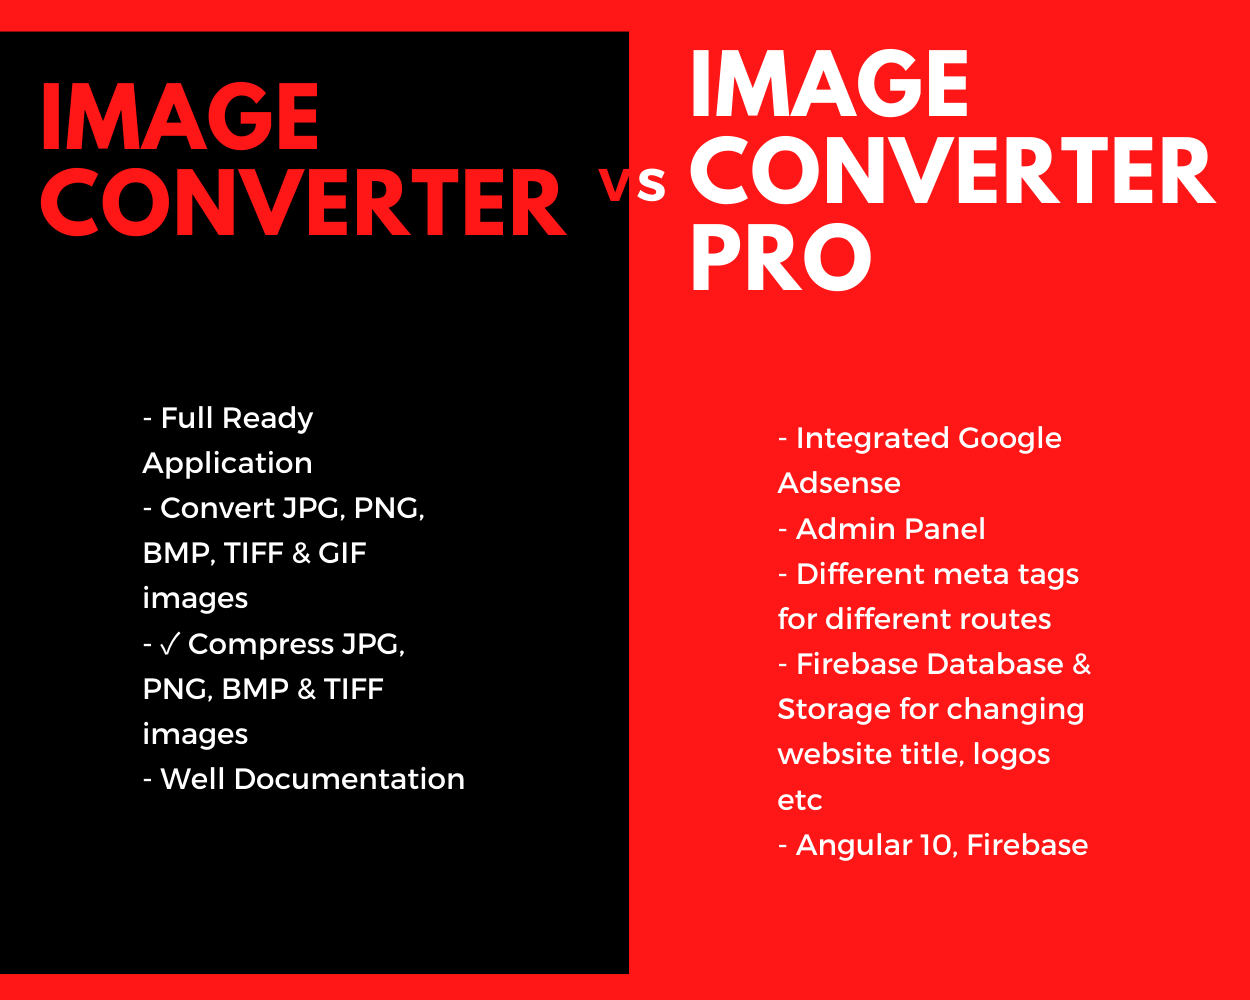 Image Converter Pro Full Production Ready Application With Admin Panel  (Angular 11 & Firebase) - 1